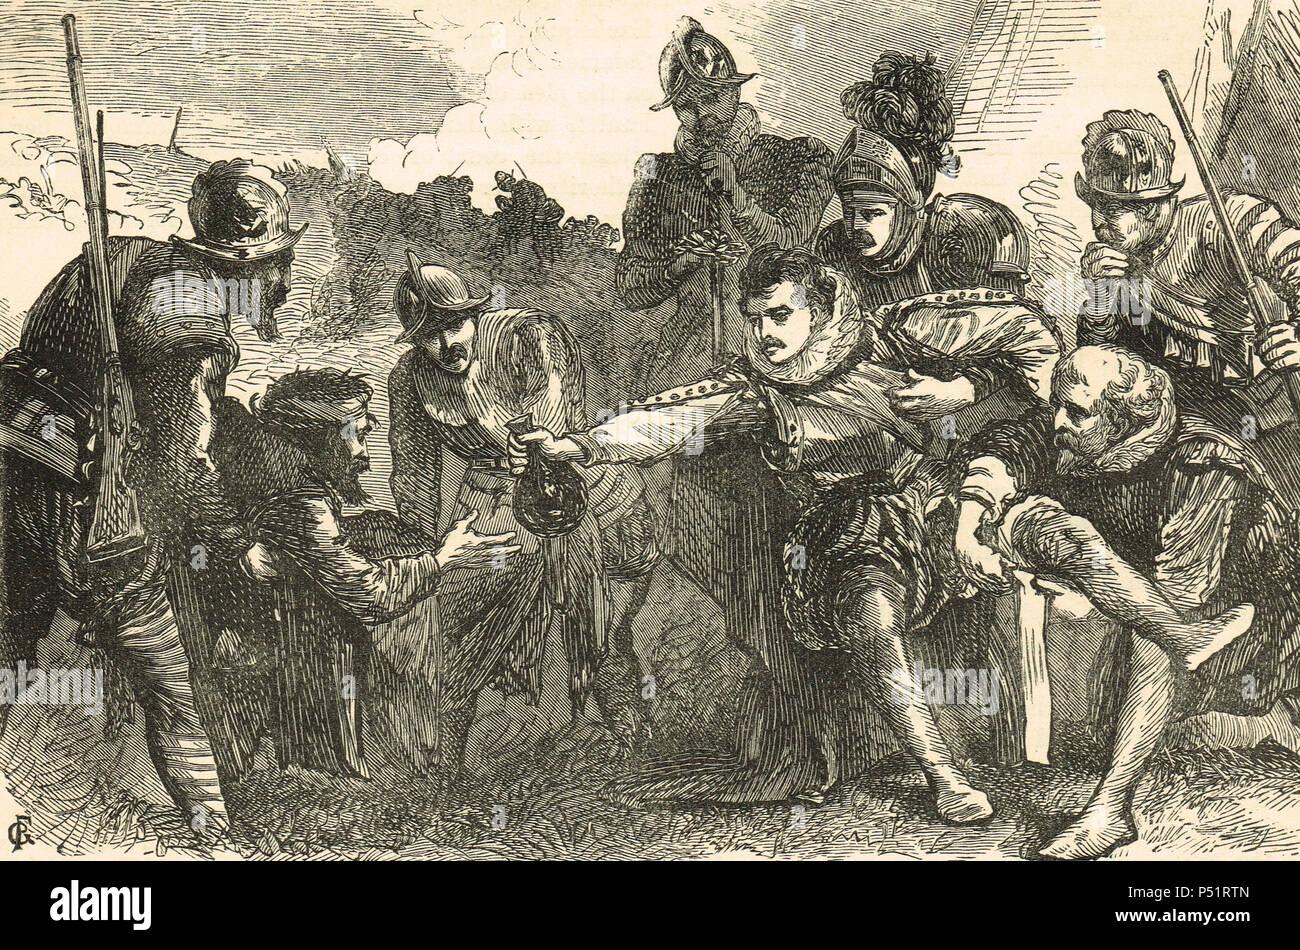 Death of Sir Philip Sidney, battle of Zutphen, 22 September 1586 - Stock Image